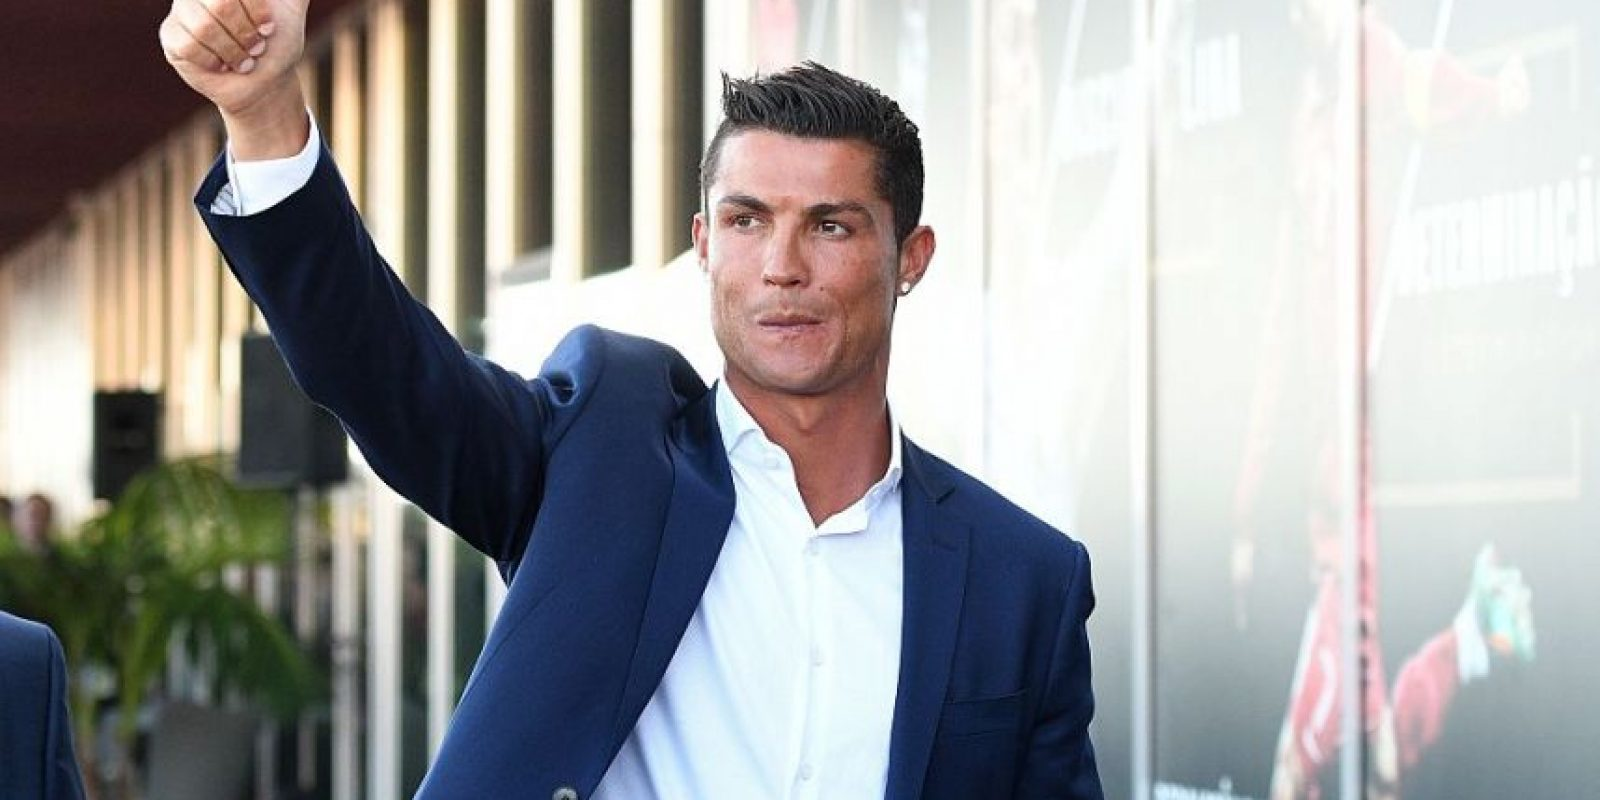 Cristiano Ronaldo no para de cosechar logros este verano en Europa. Foto:Getty Images. Imagen Por: